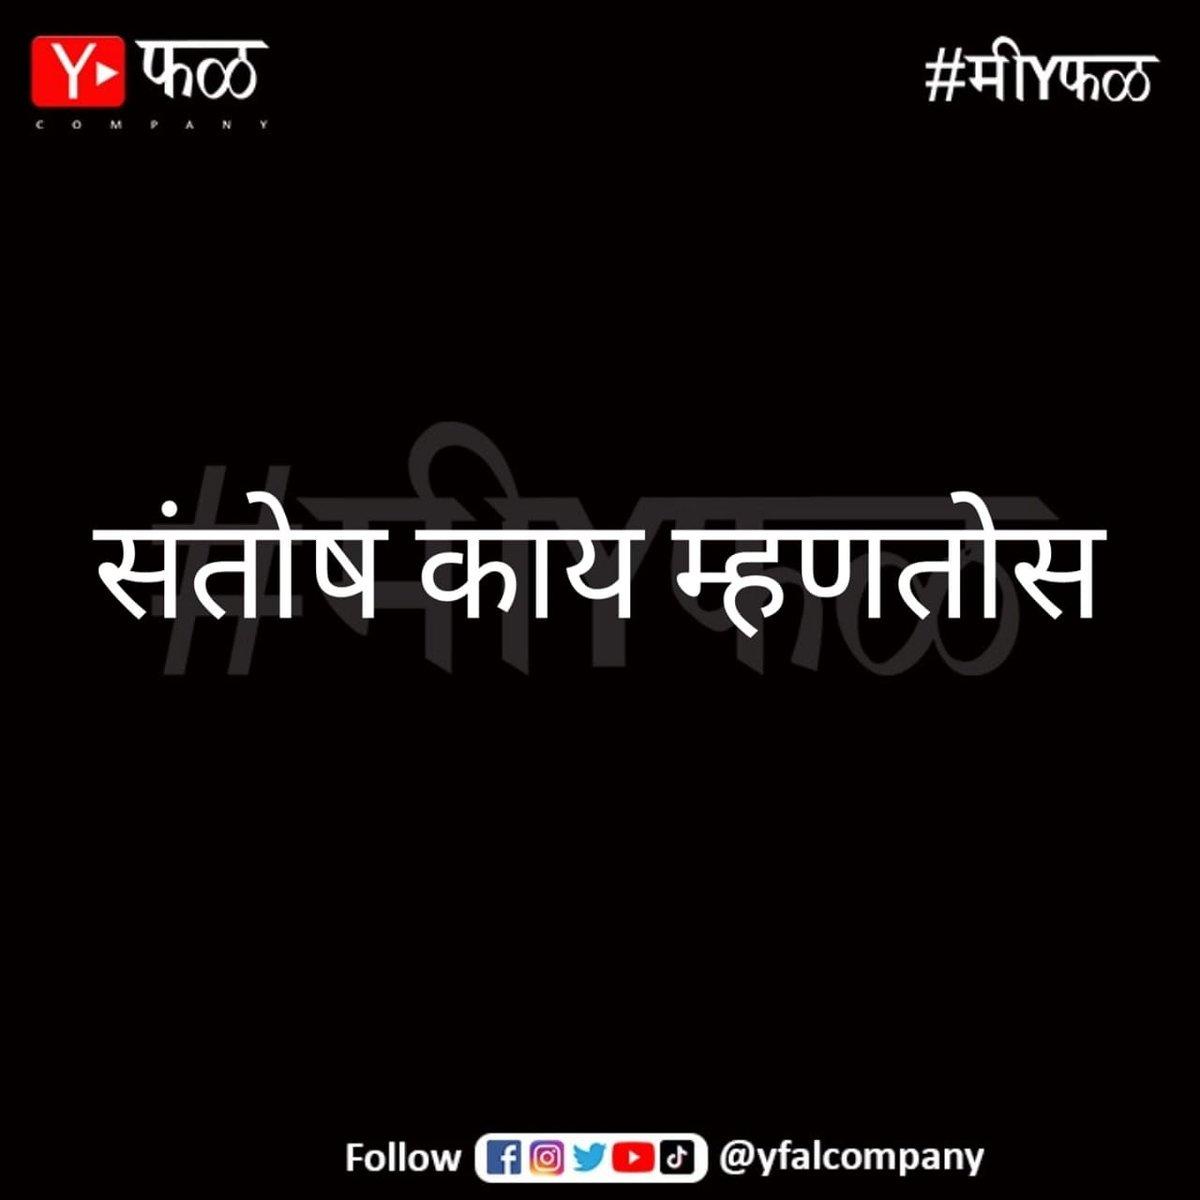 संतोष काय म्हणतोस?  @Santosh_Juvekar Tag Kara tumchya list madhlya  संतोष ला #मीYफळ #YFalCompany #marathicomedy #MarathiMemes #marathiactors #maharashtramaza #maharashtra #pune #punekar #mumbai #mimarathi #मराठी #marathibana #santosh #memespic.twitter.com/3EAyYONwt5